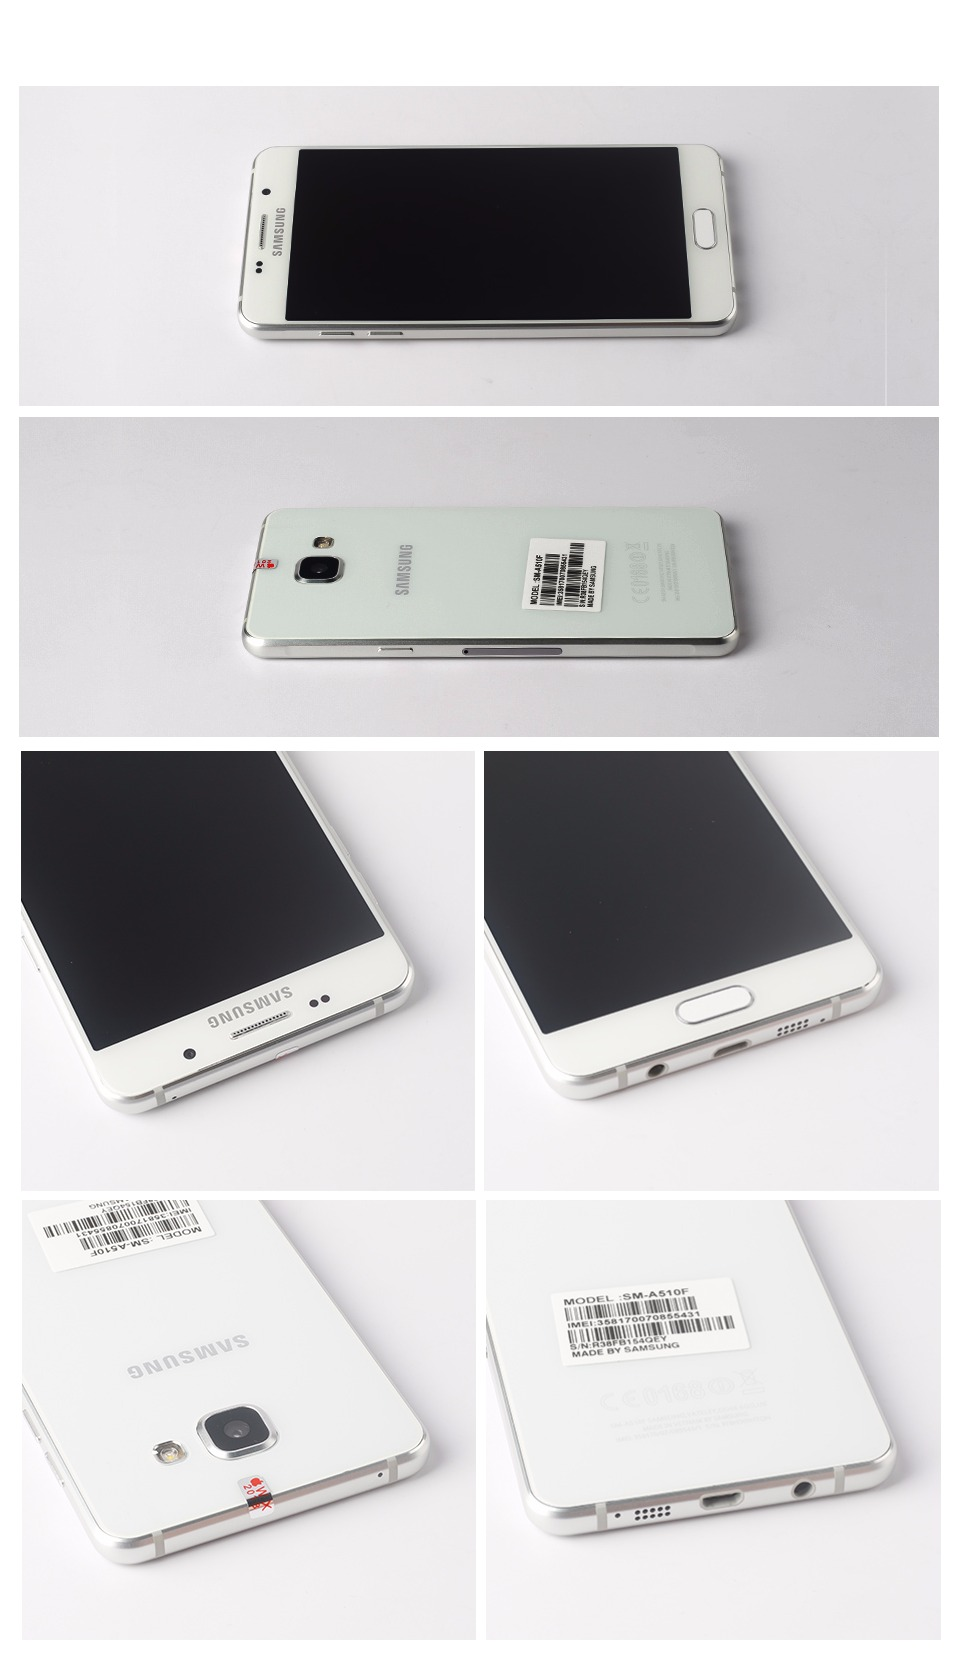 Samsung Galaxy A5 2016 Smartphone A510f 4g Lte 16gb Rom 2gb New Sm Ram 2 Memori Description Bestsupplier Specilizedinusedphonesforeigntradebusinessformorethan10years